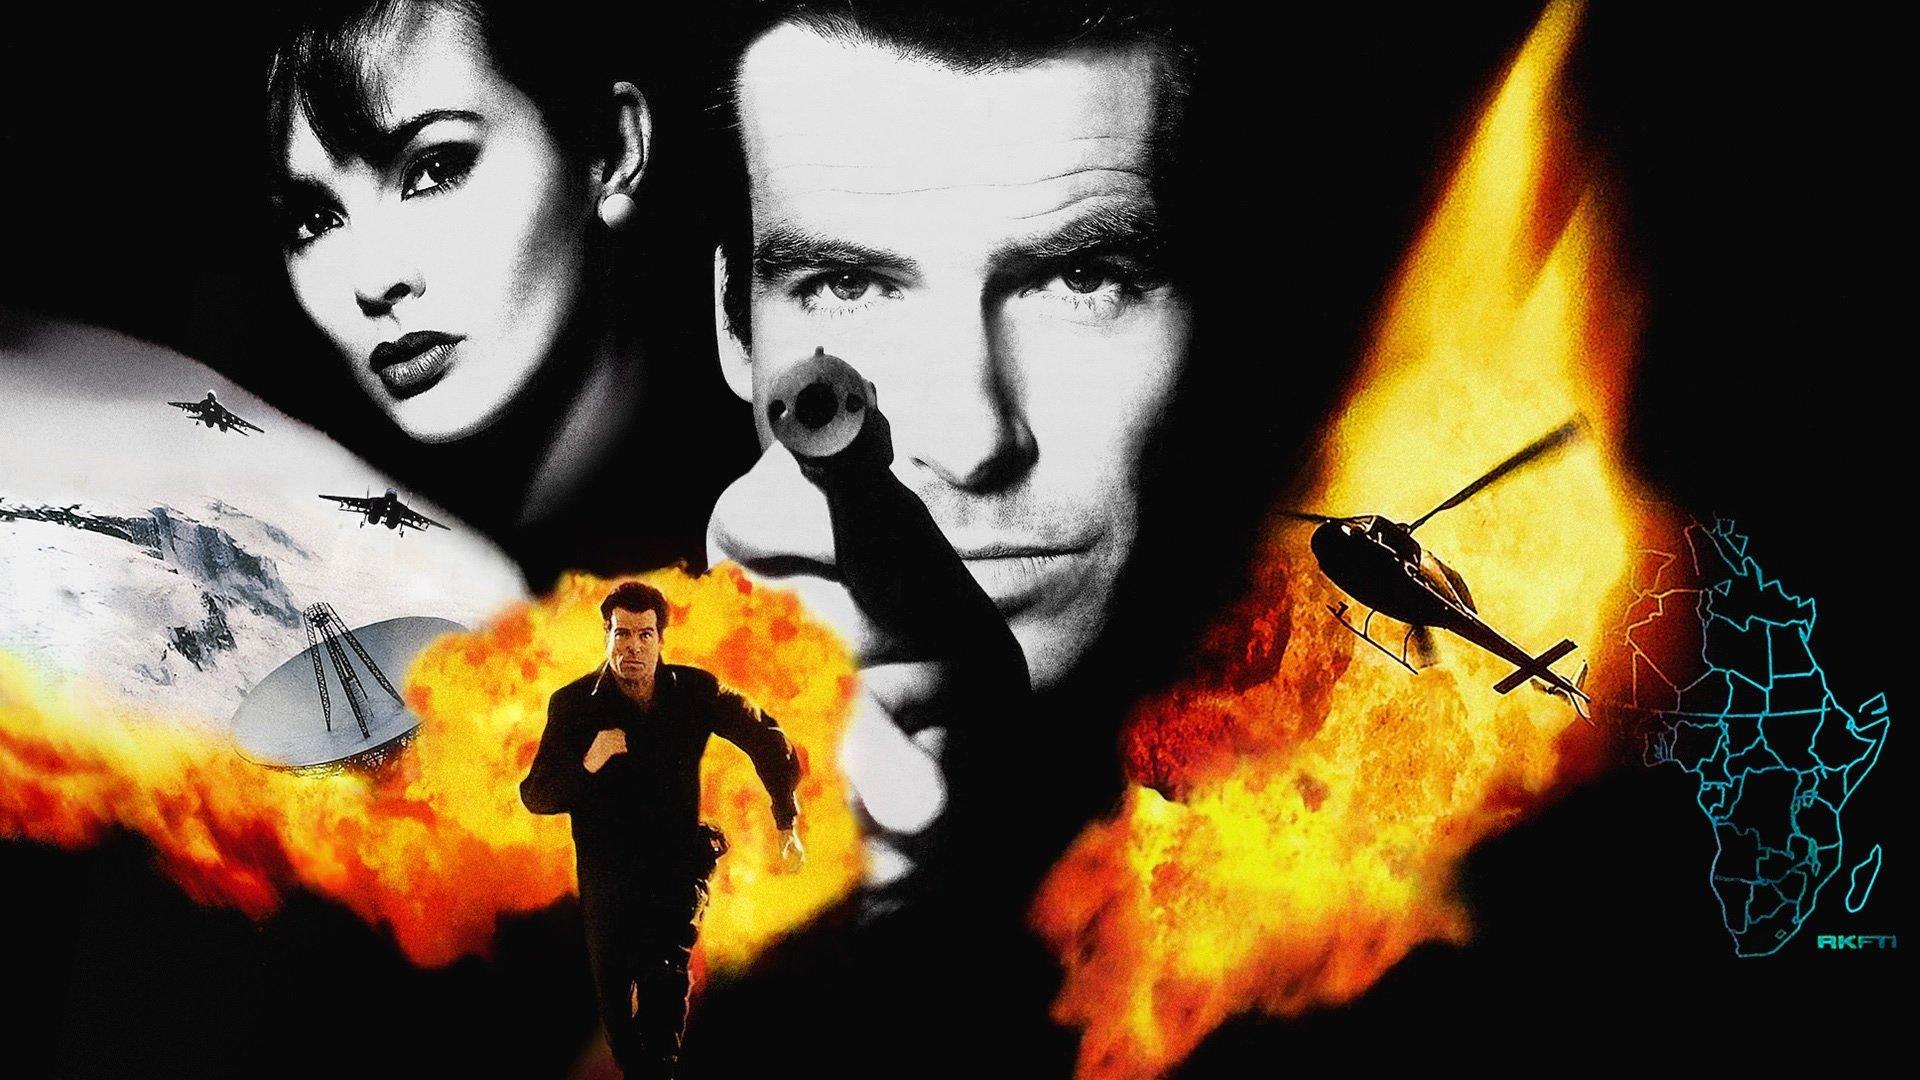 Goldeneye James Bond 007 movie at 25